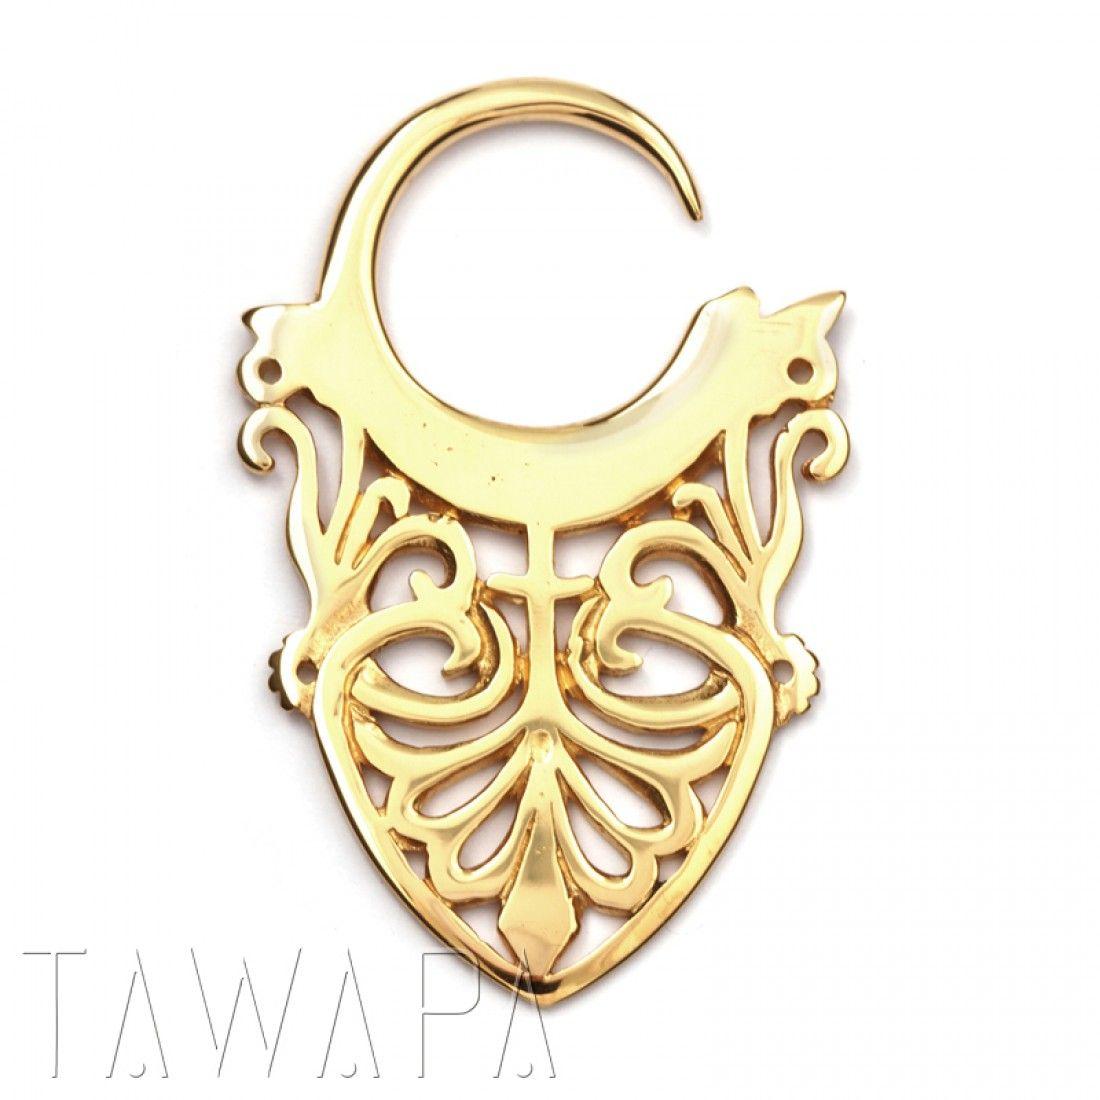 Belly button piercing names  Gold Plated Small Maori Damask  Piercings  Pinterest  Maori